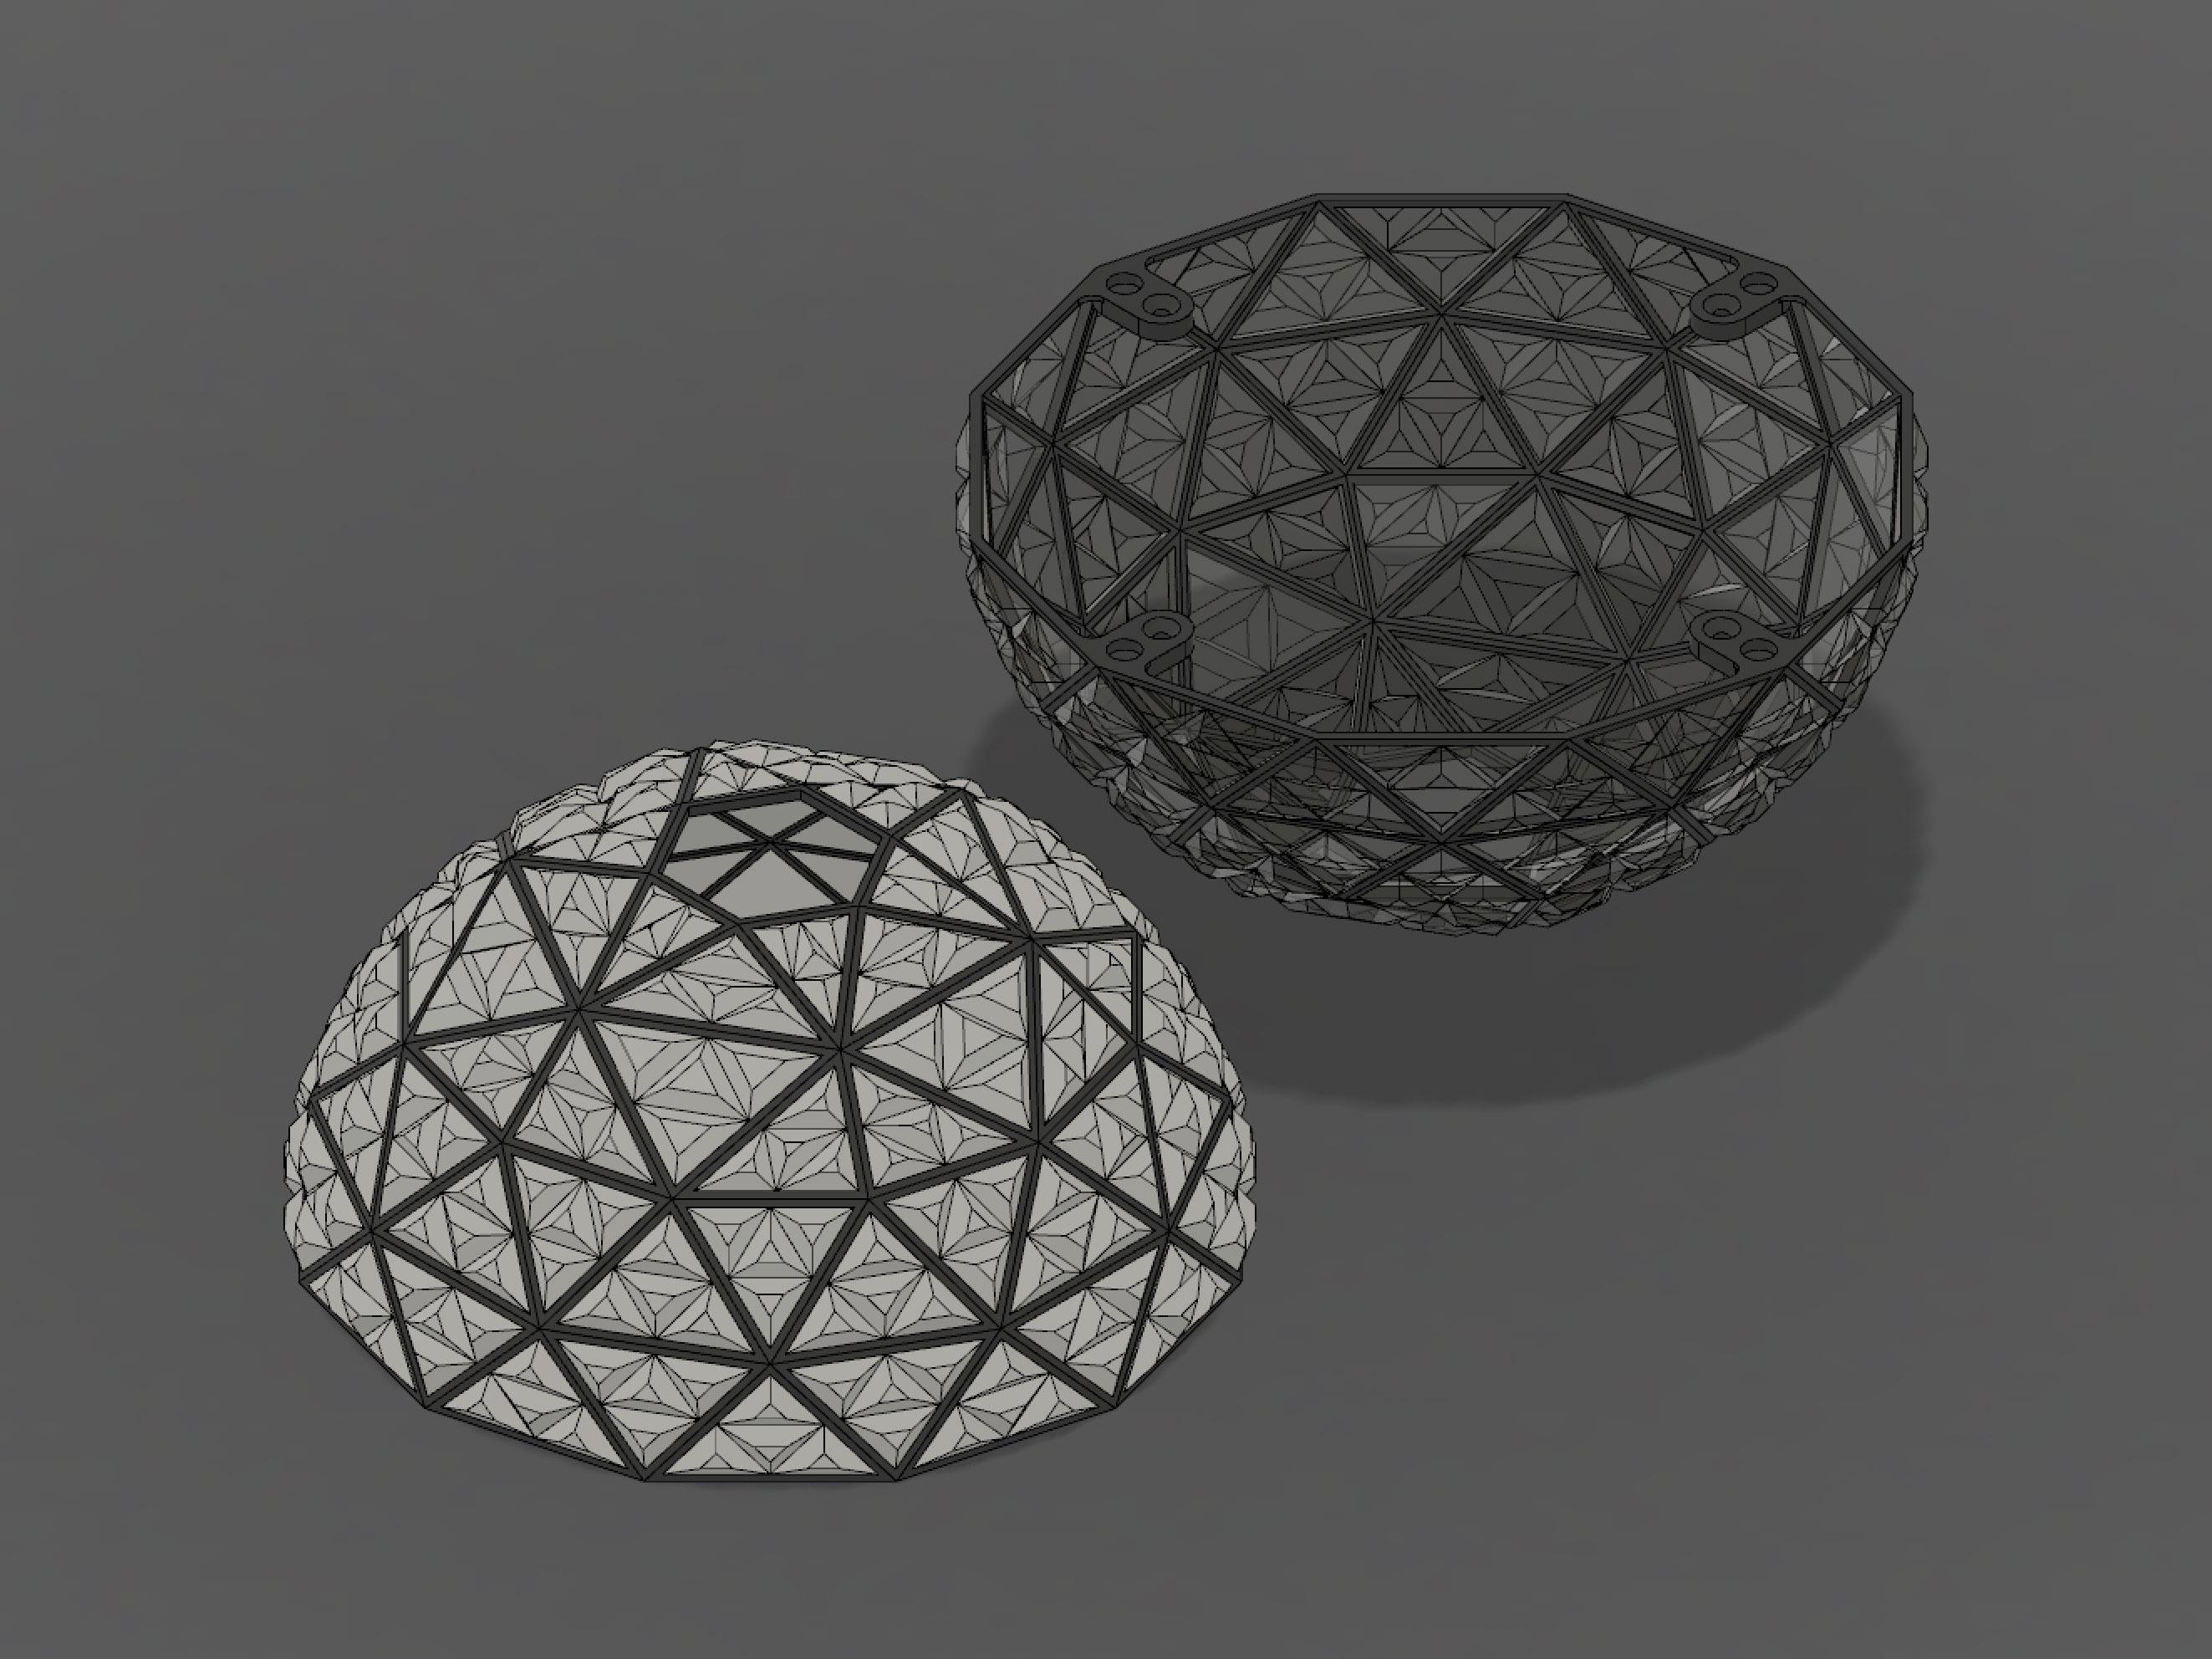 3d_printing_3dp-domes.jpg